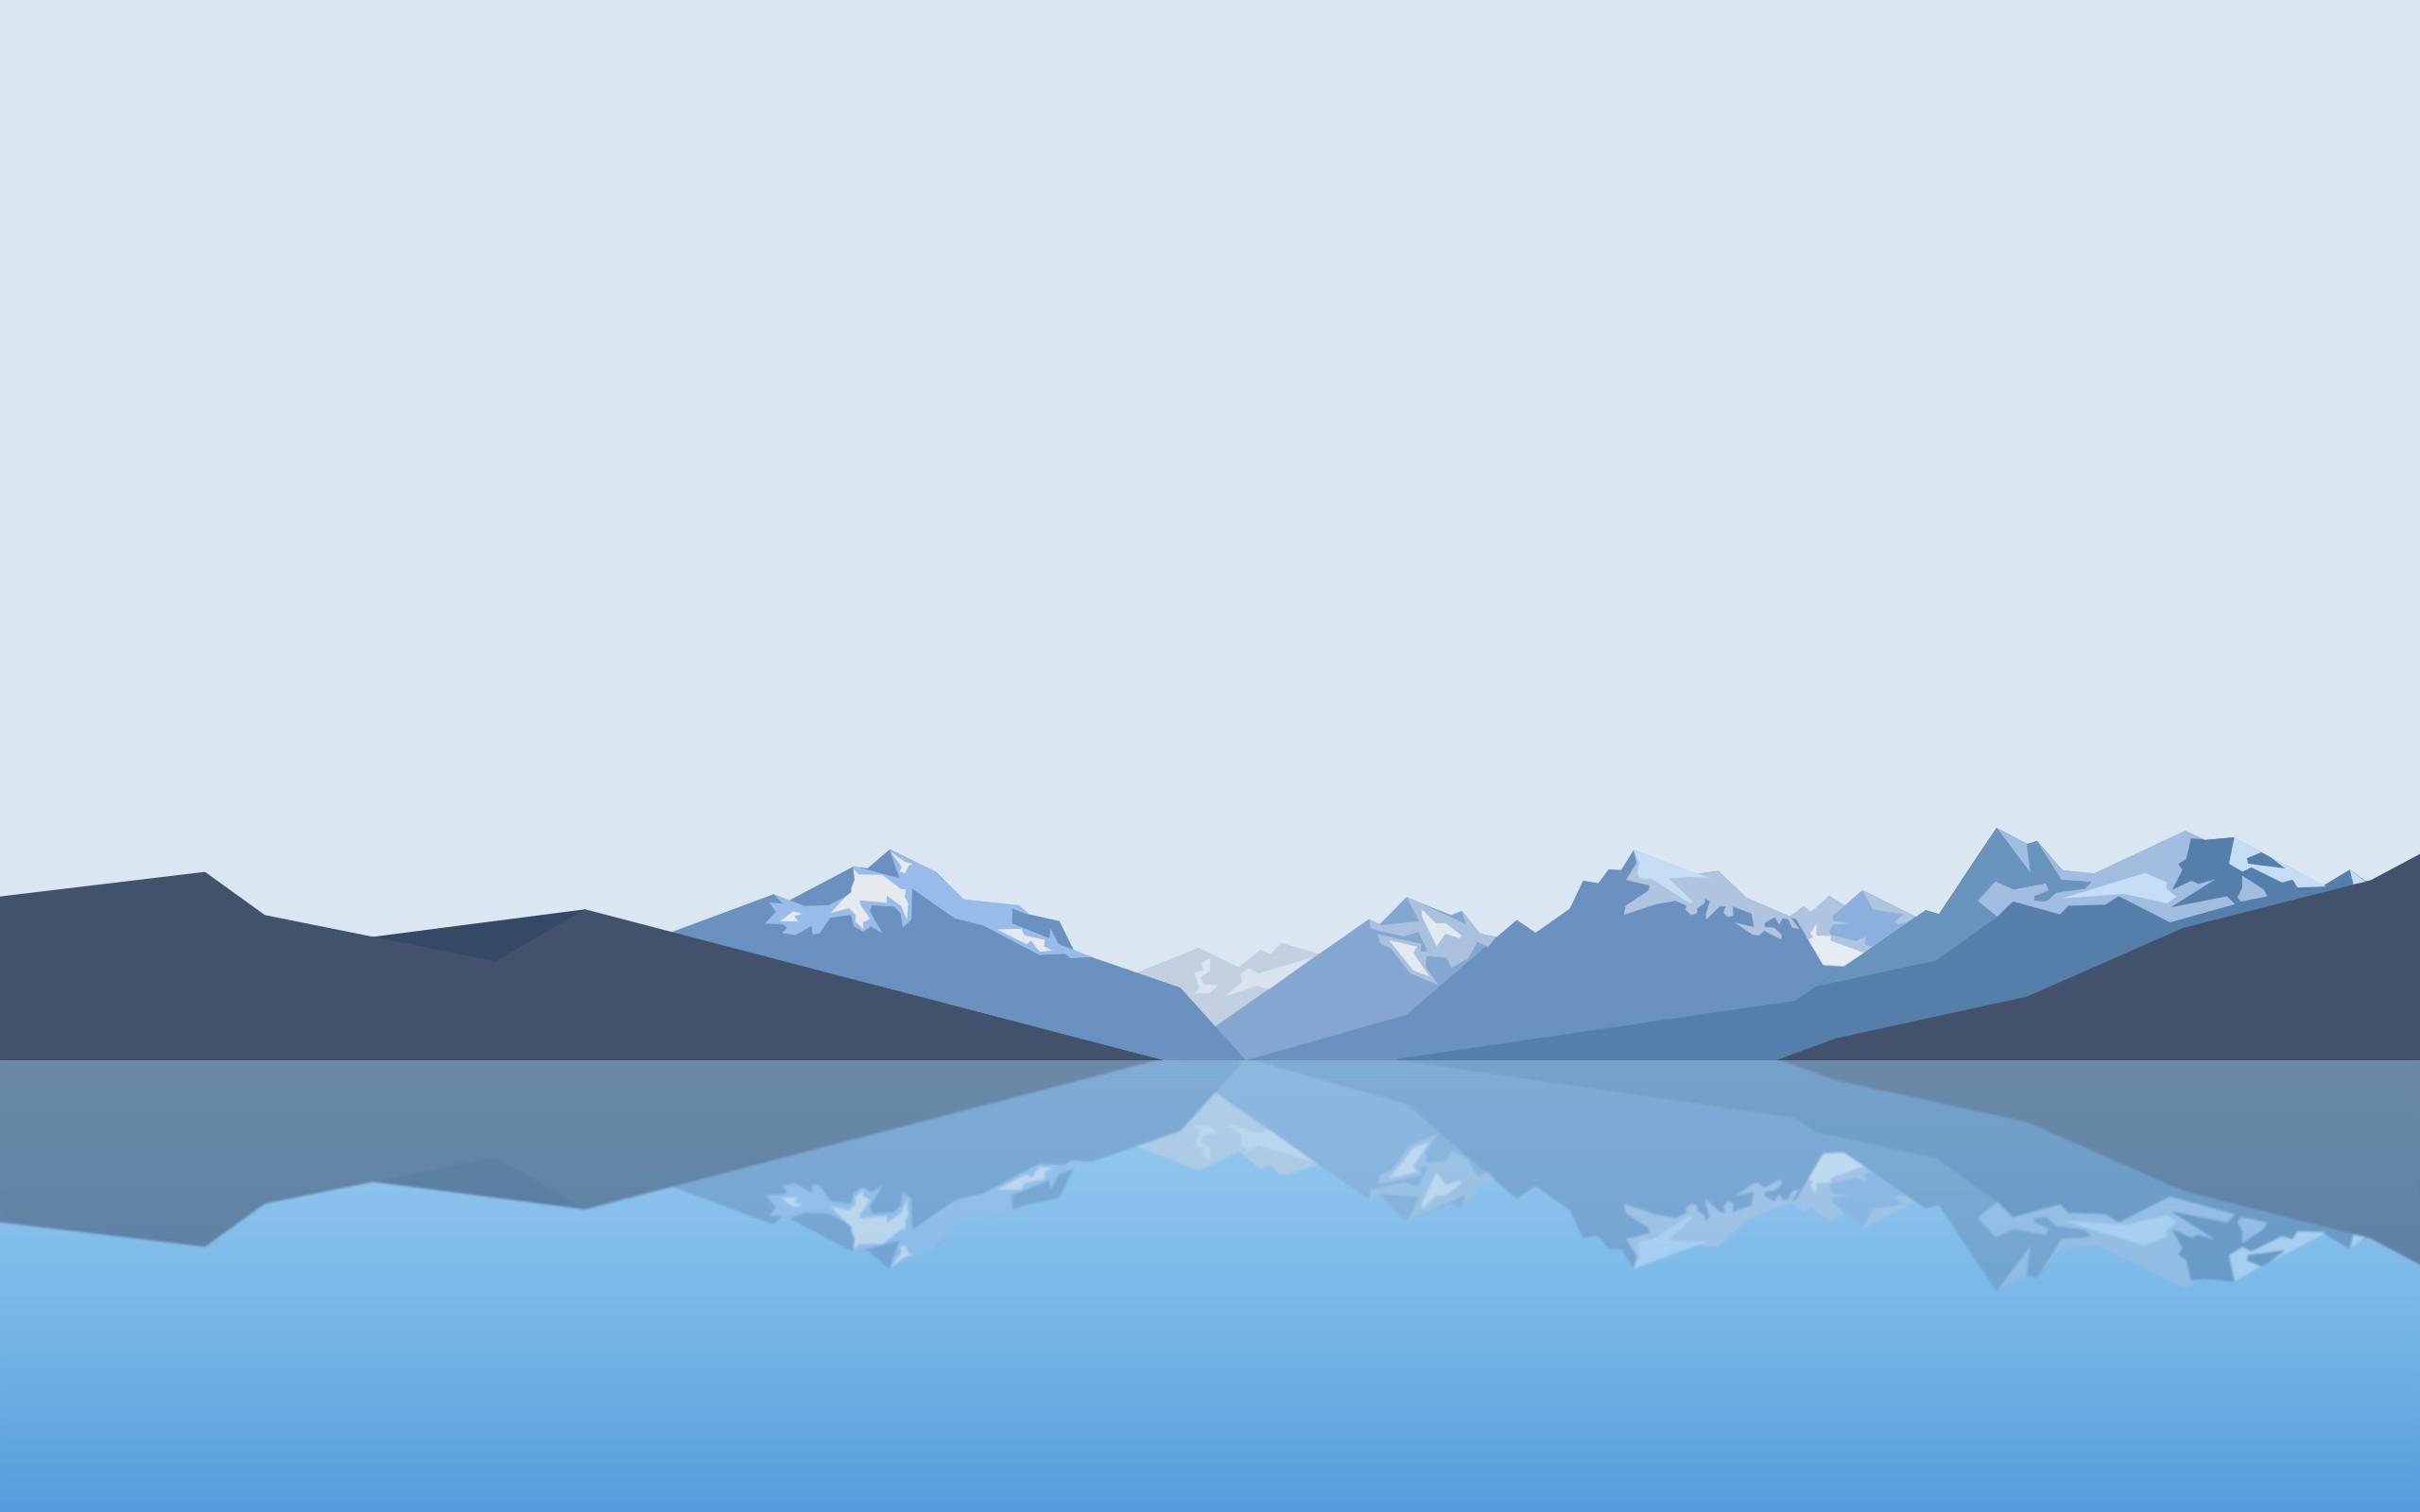 Lake Mountain Reflection Minimalism Wallpapers Hd: Wallpaper : Landscape, Mountains, Lake, Minimalism